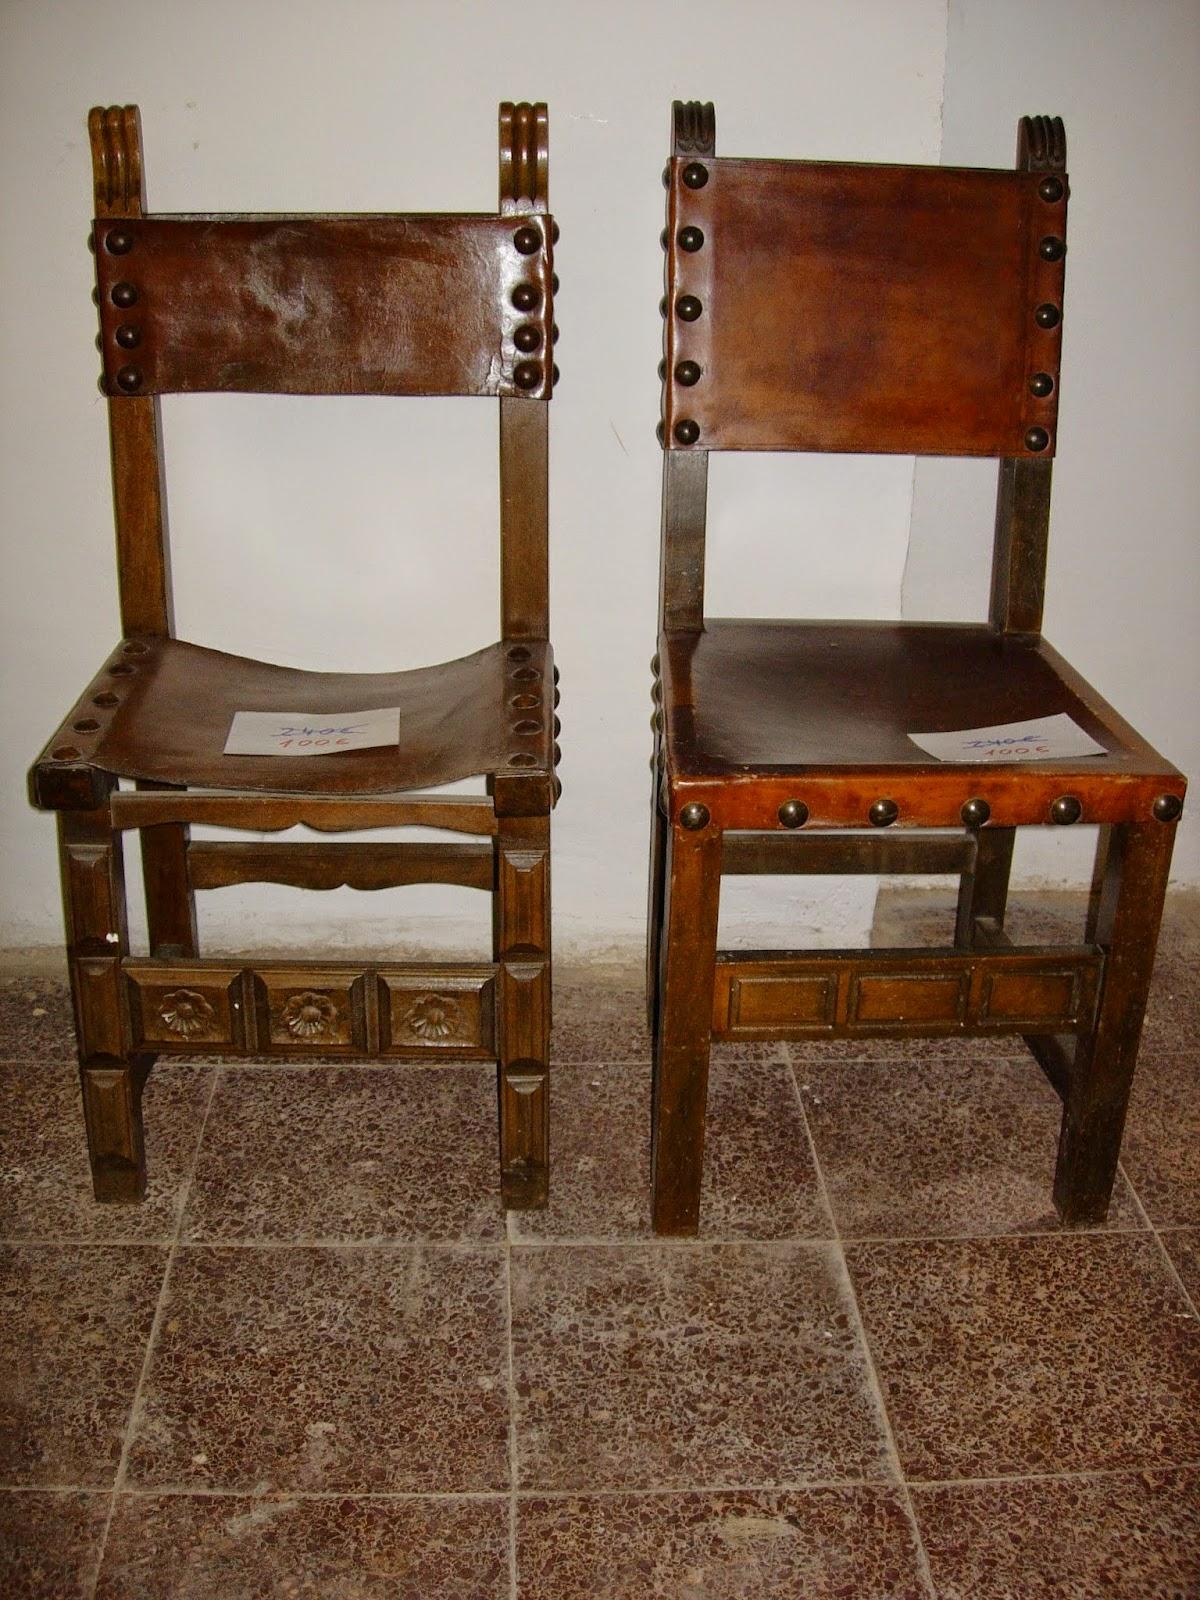 Antig edades fern ndez muebles mesas sillas - Sillas antiguas de madera ...